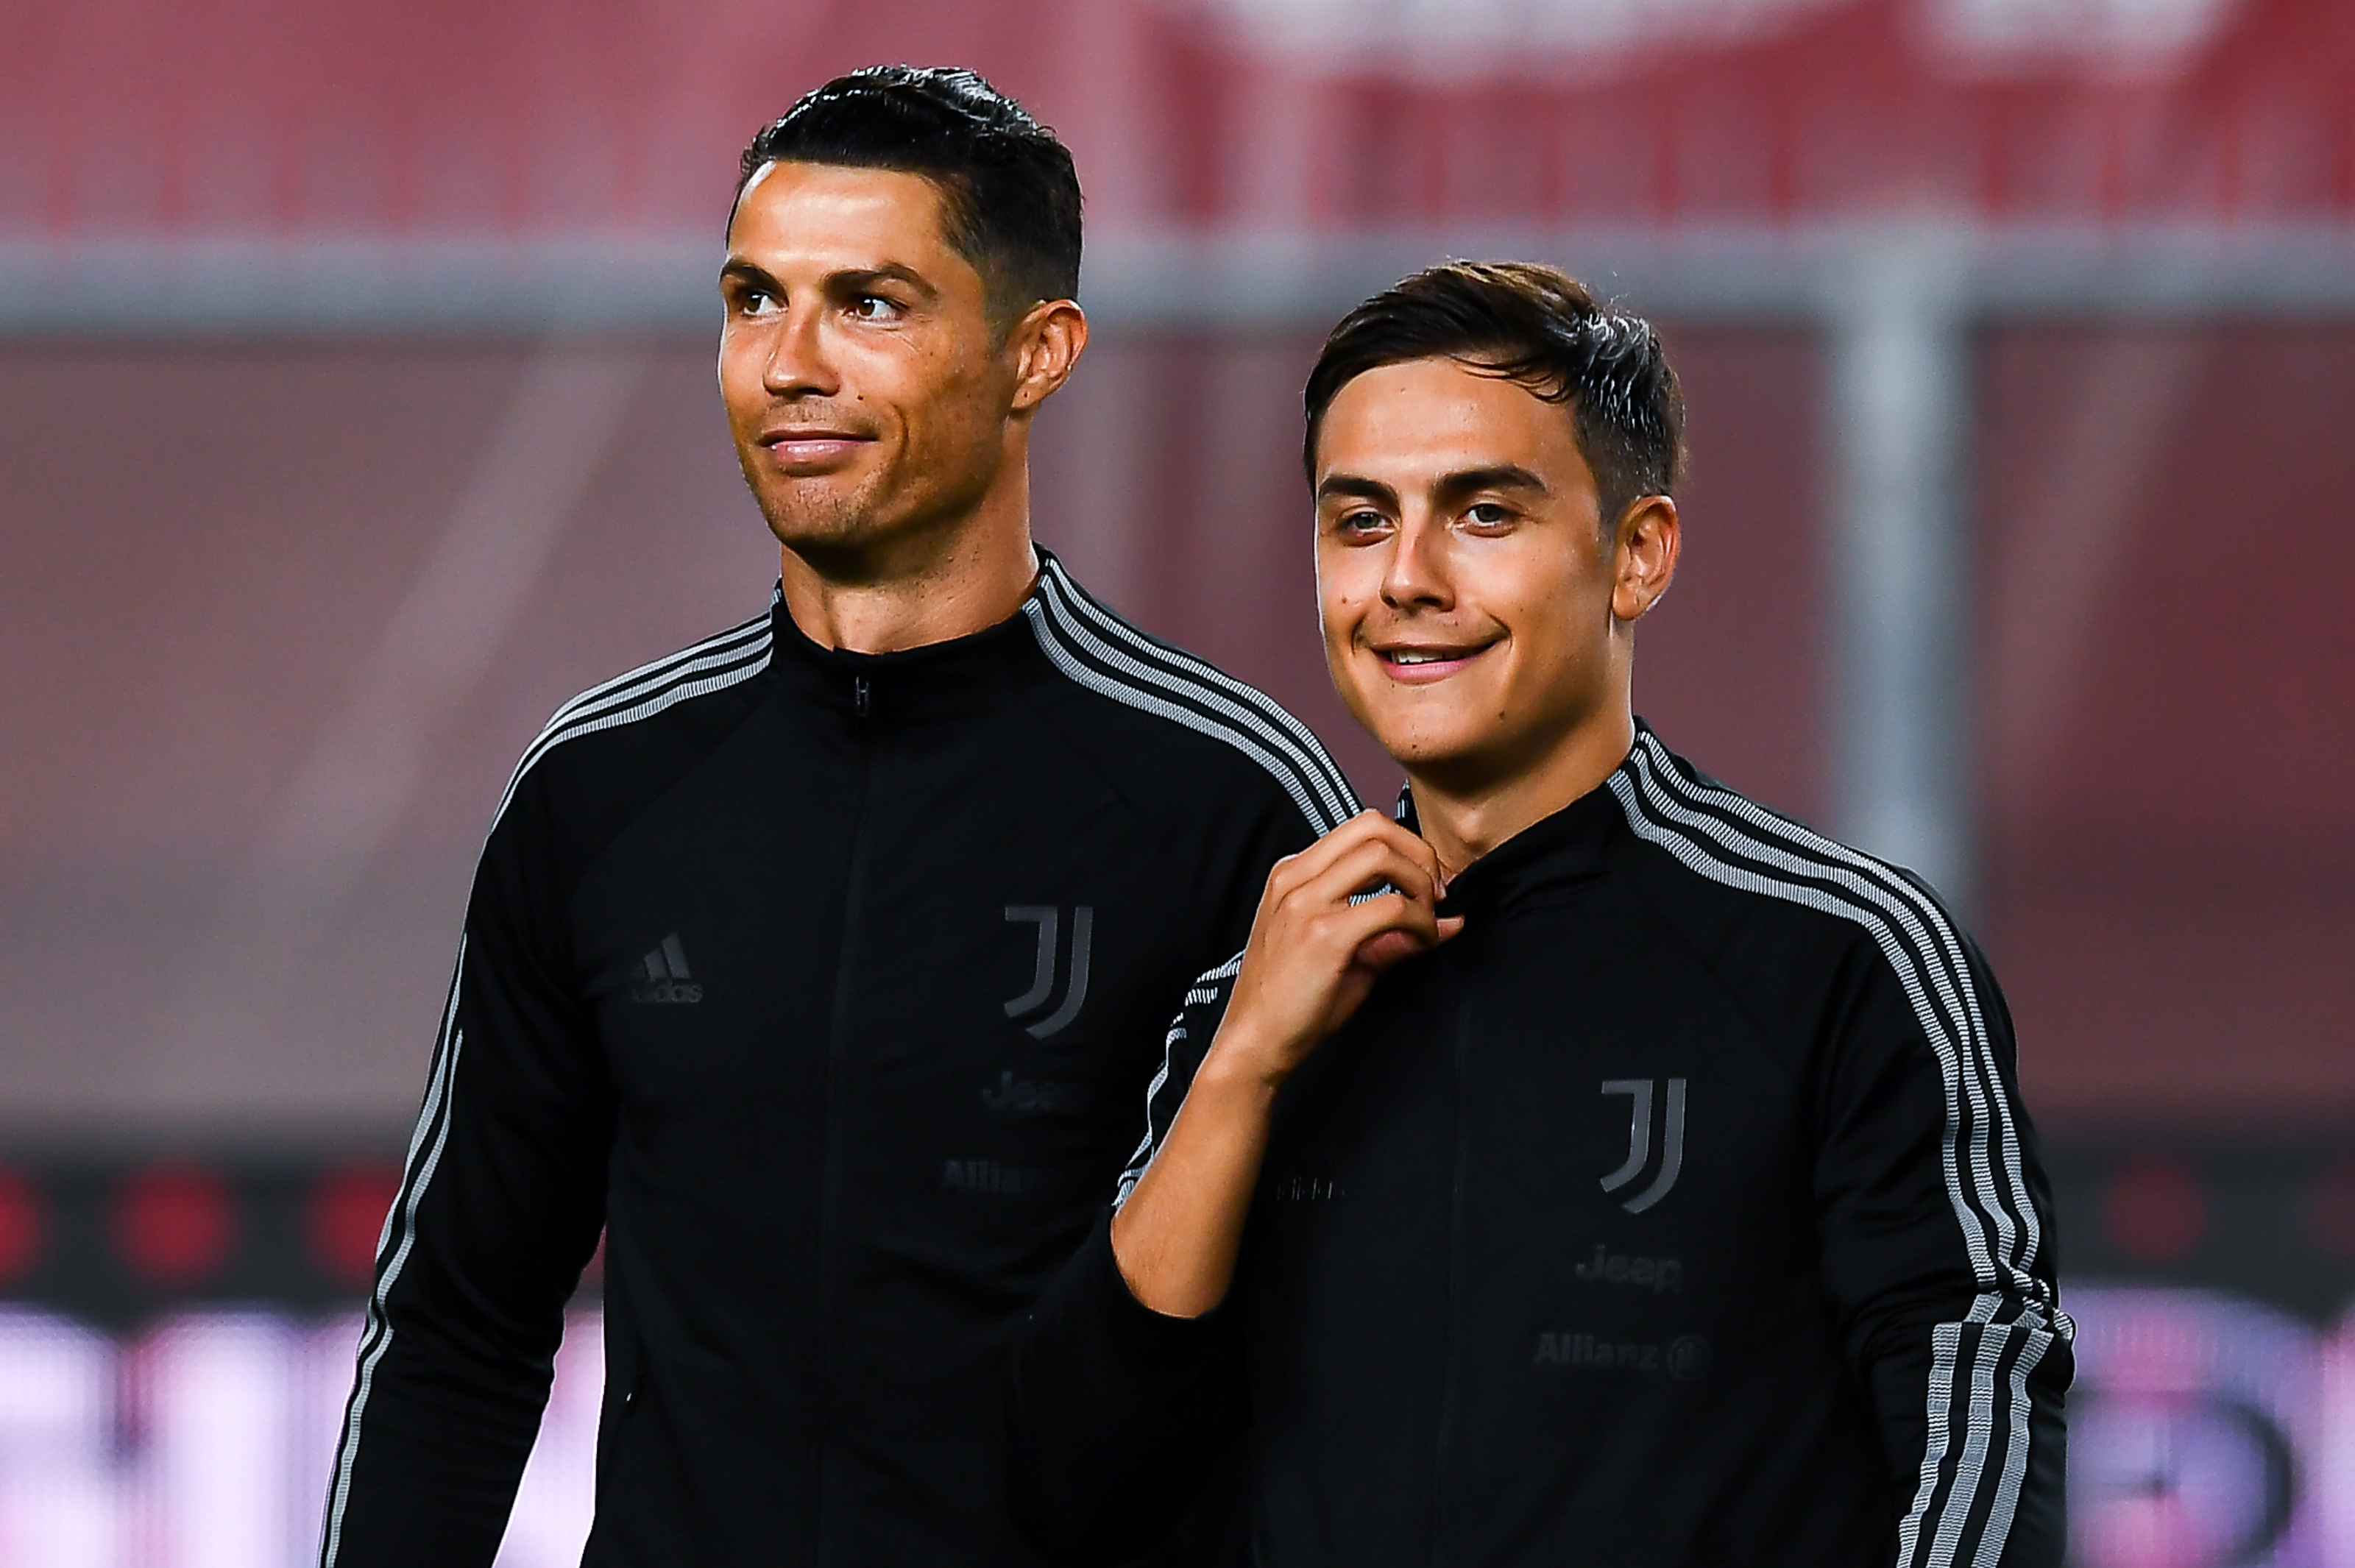 Cristiano Ronaldo S Juventus Runs Away With Barcelona S Prime Target